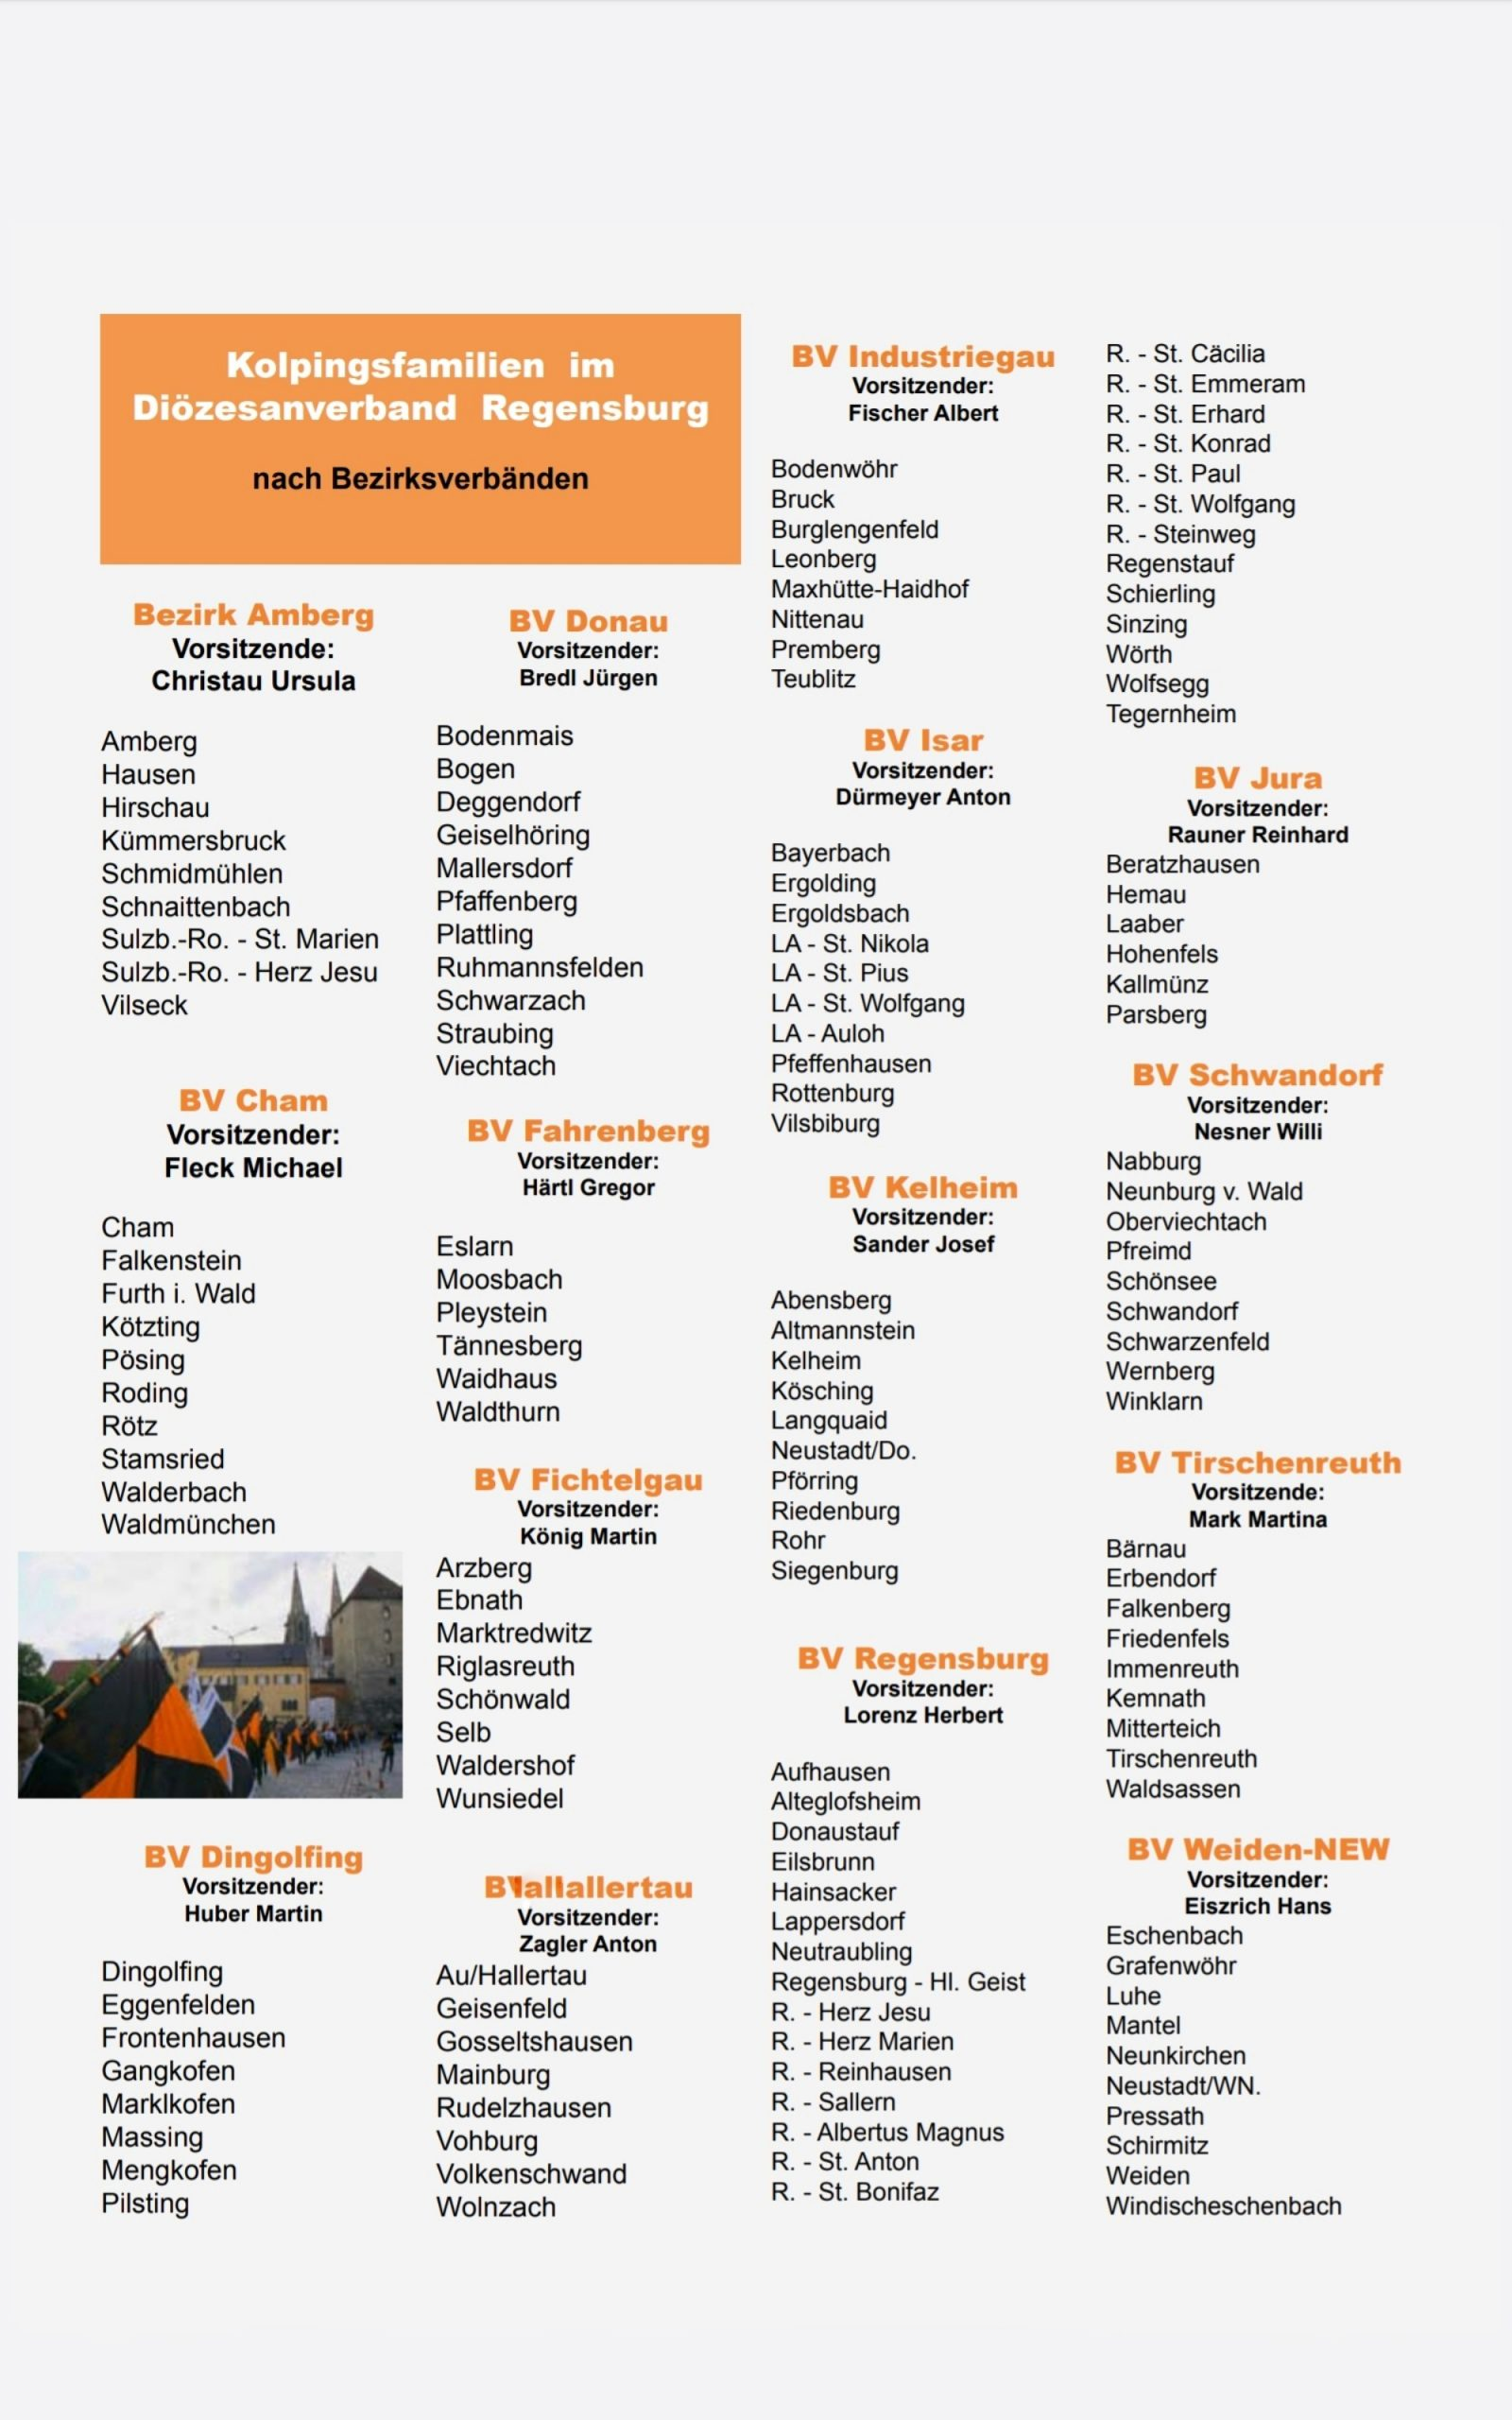 Kolpingsfamilien im Diözesanverband Regensburg nach Bezirksverbänden